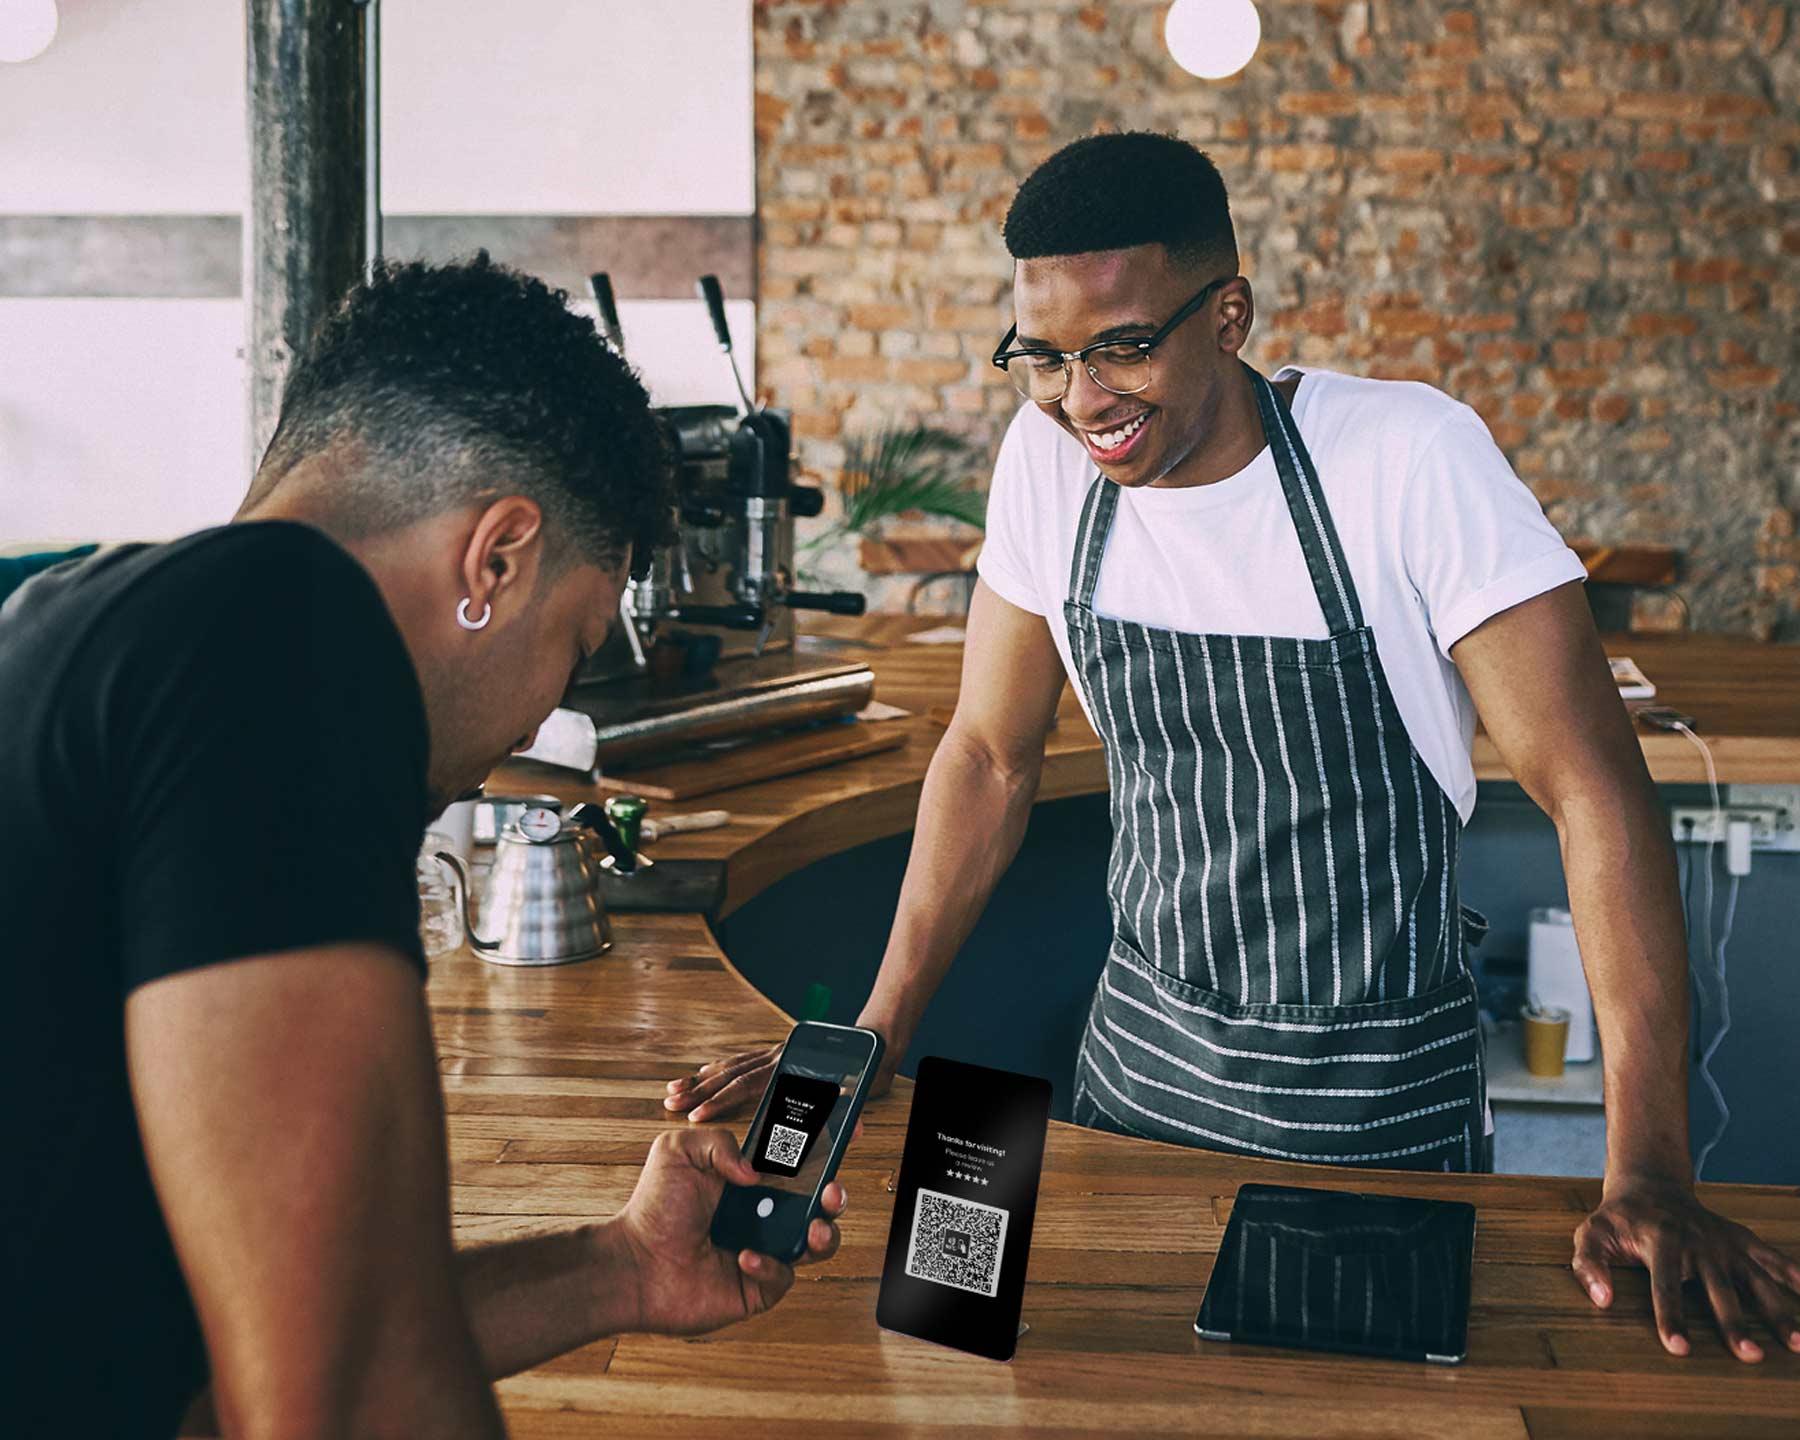 Lokaler Unternehmer bekommt Online-Kunden-Bewertung.